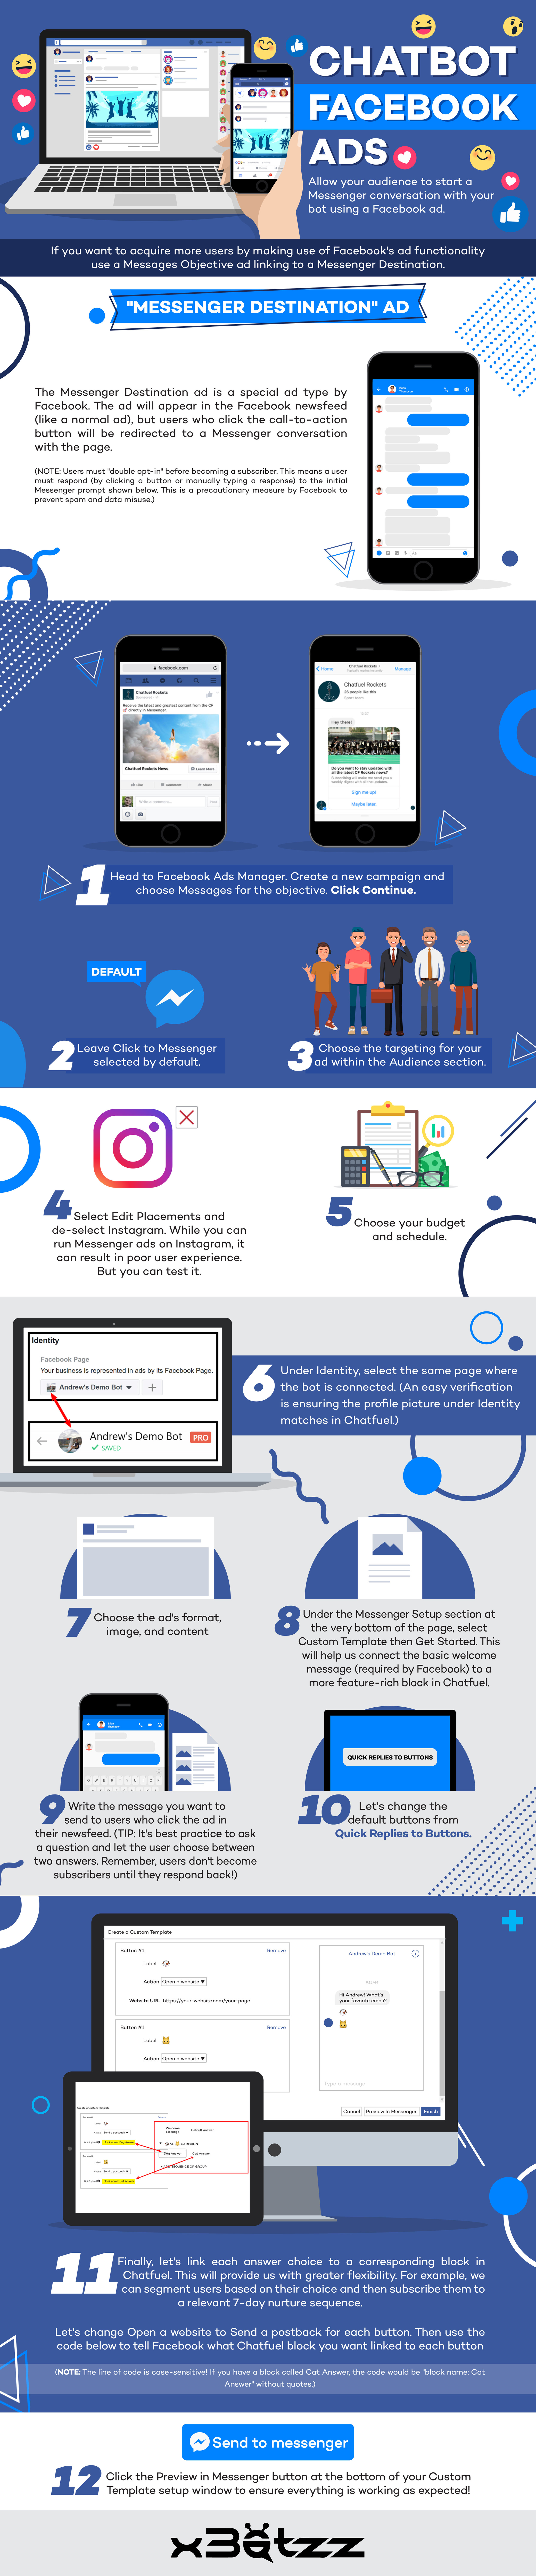 19922-The T-Chatbot FB Ads-V2-01.jpg